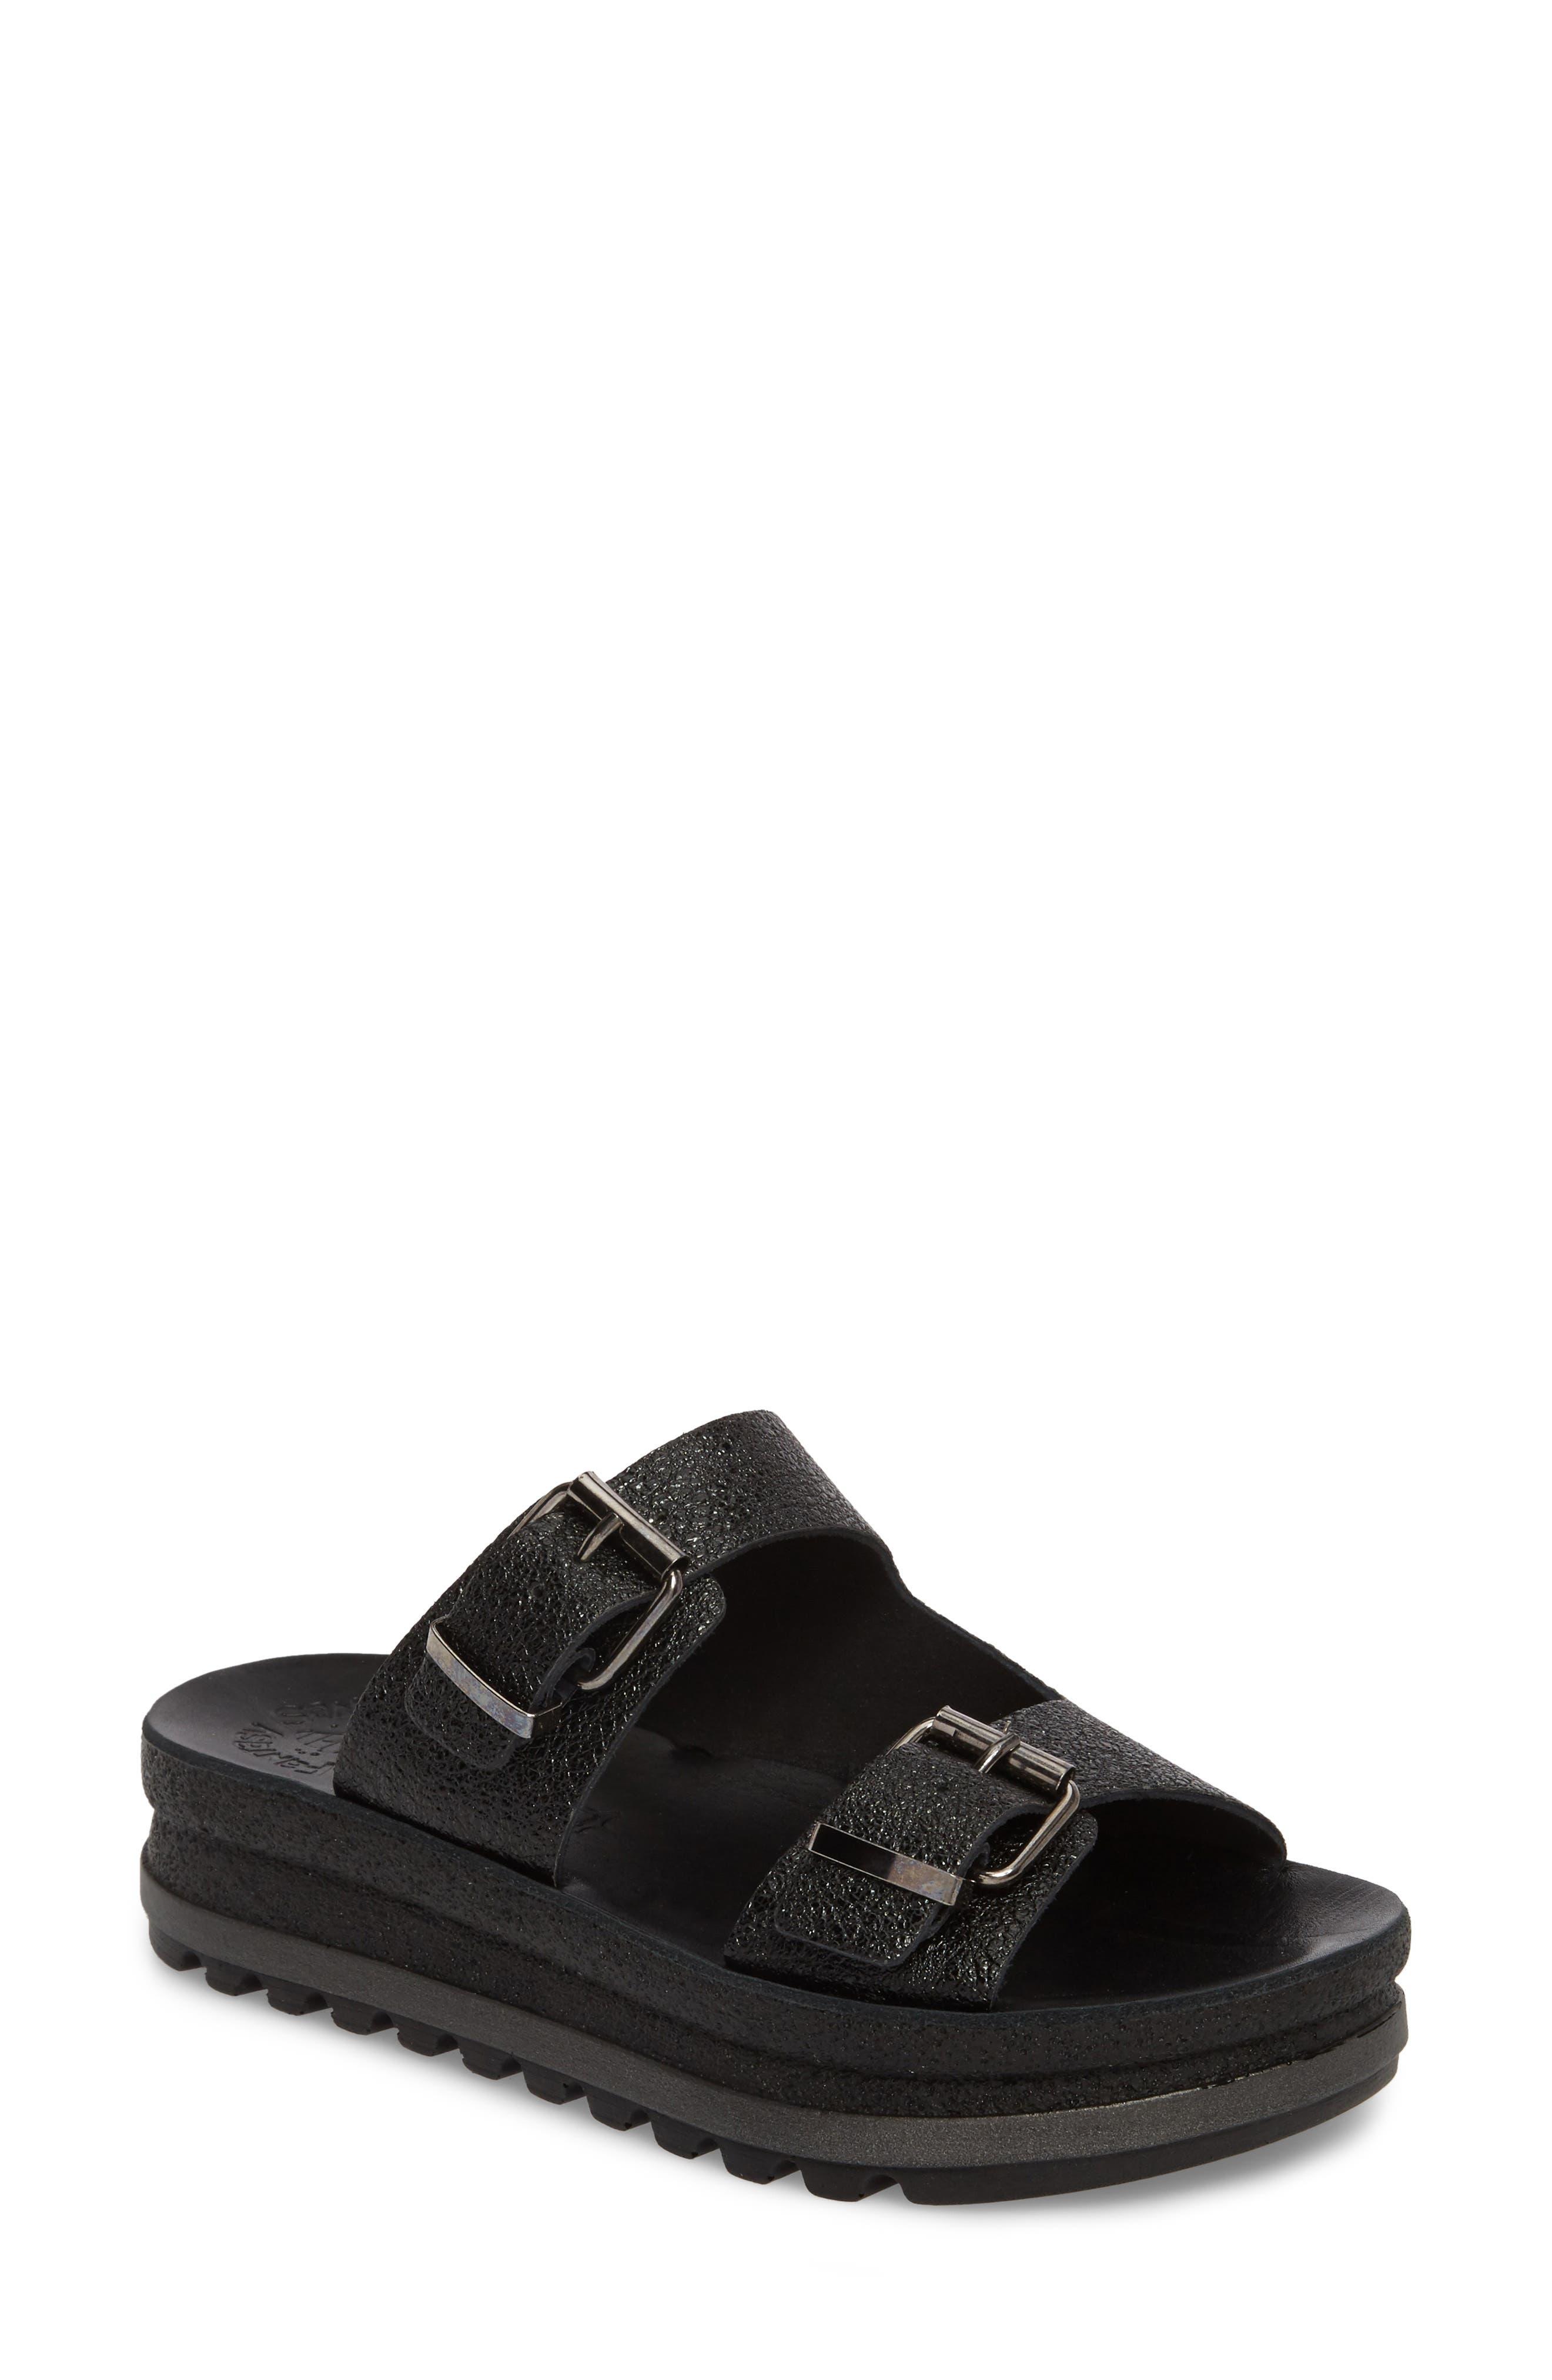 Melanie Platform Sandal,                             Main thumbnail 1, color,                             Black Spacey Leather